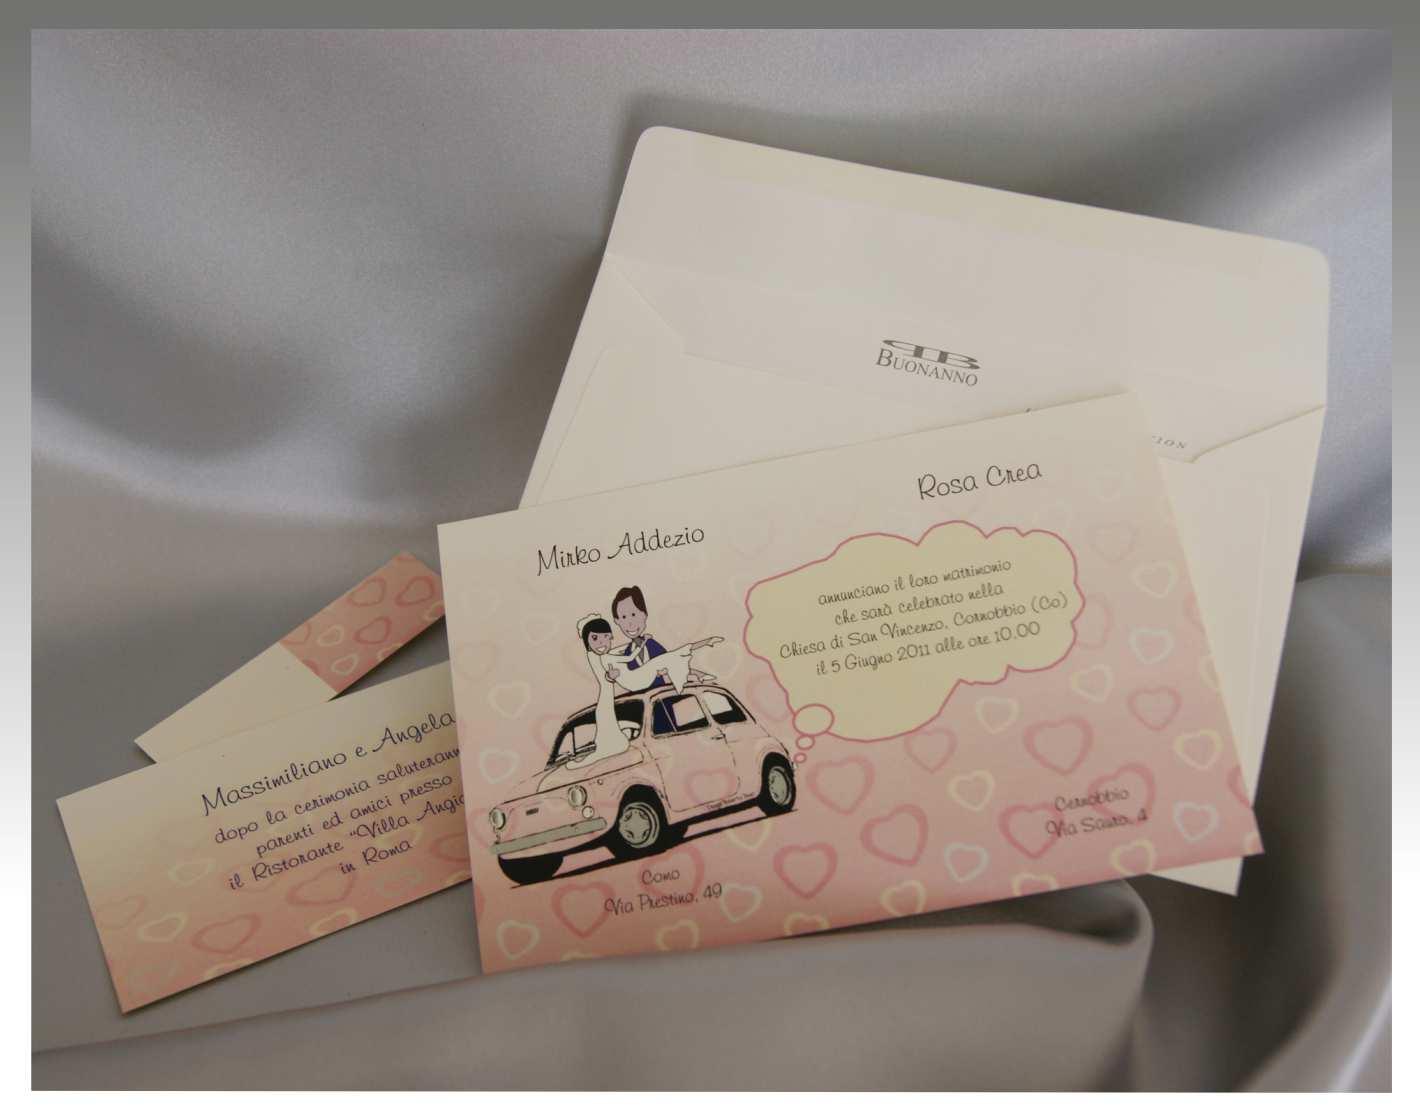 Inviti Matrimonio Natalizio : Inviti matrimonio simpatici